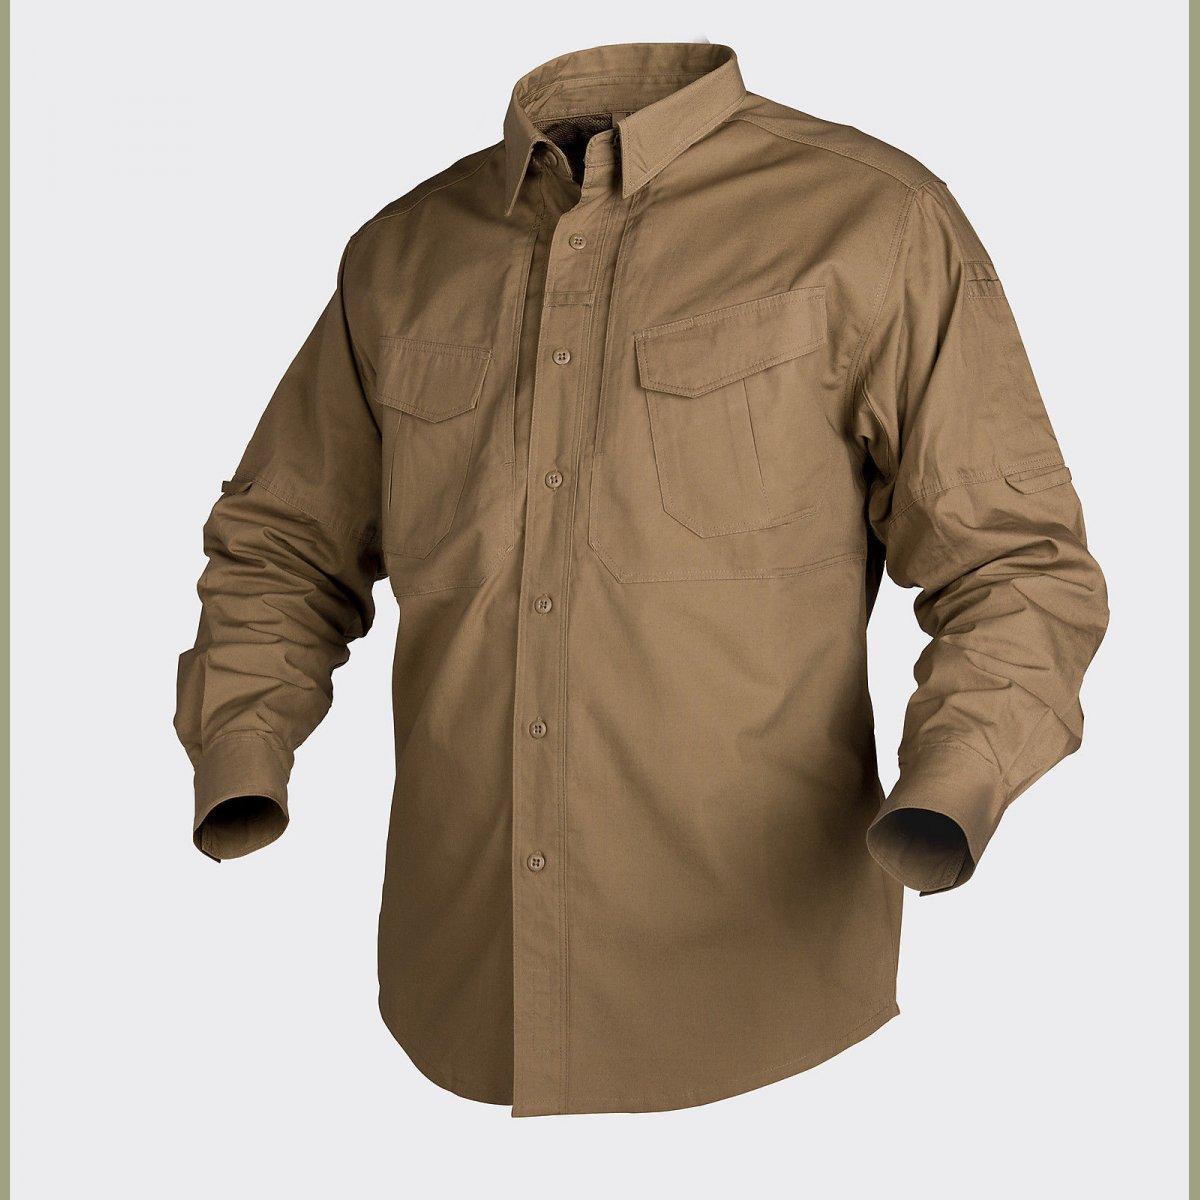 Helikon tex defender long sleeve shirt coyote braun langarm hemd canvas stoff.jpg